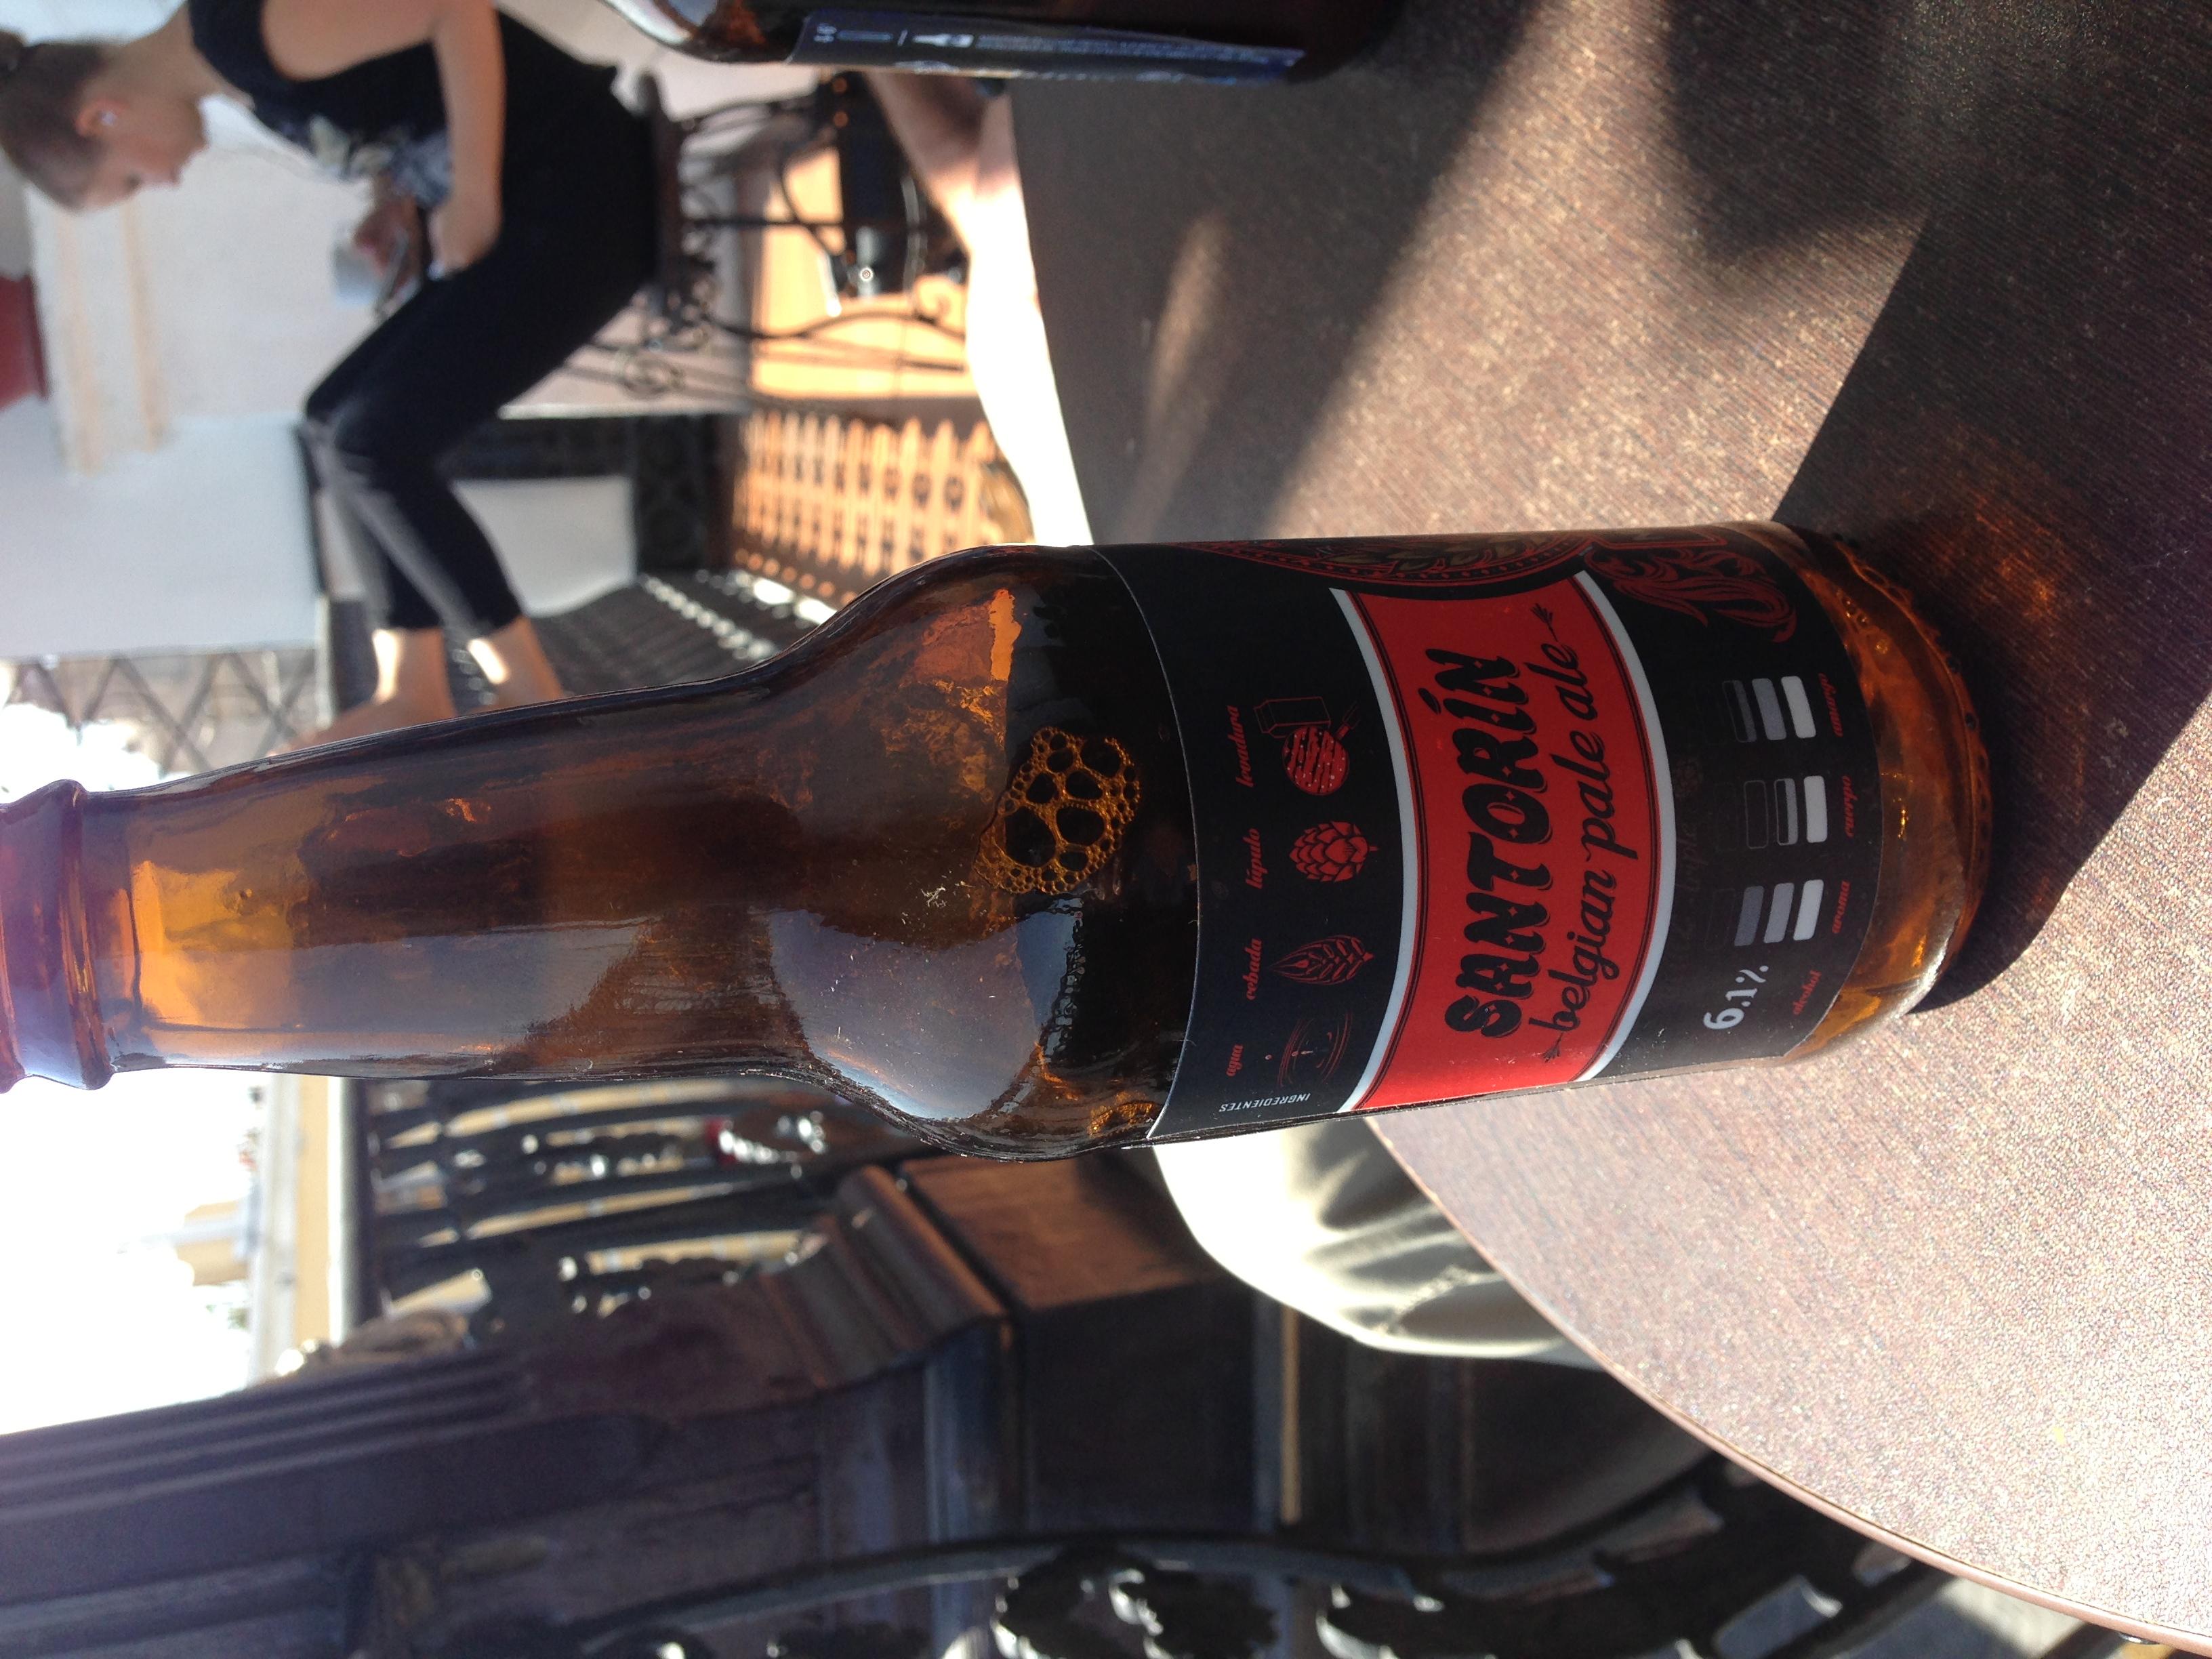 Santorin belgian pale ale